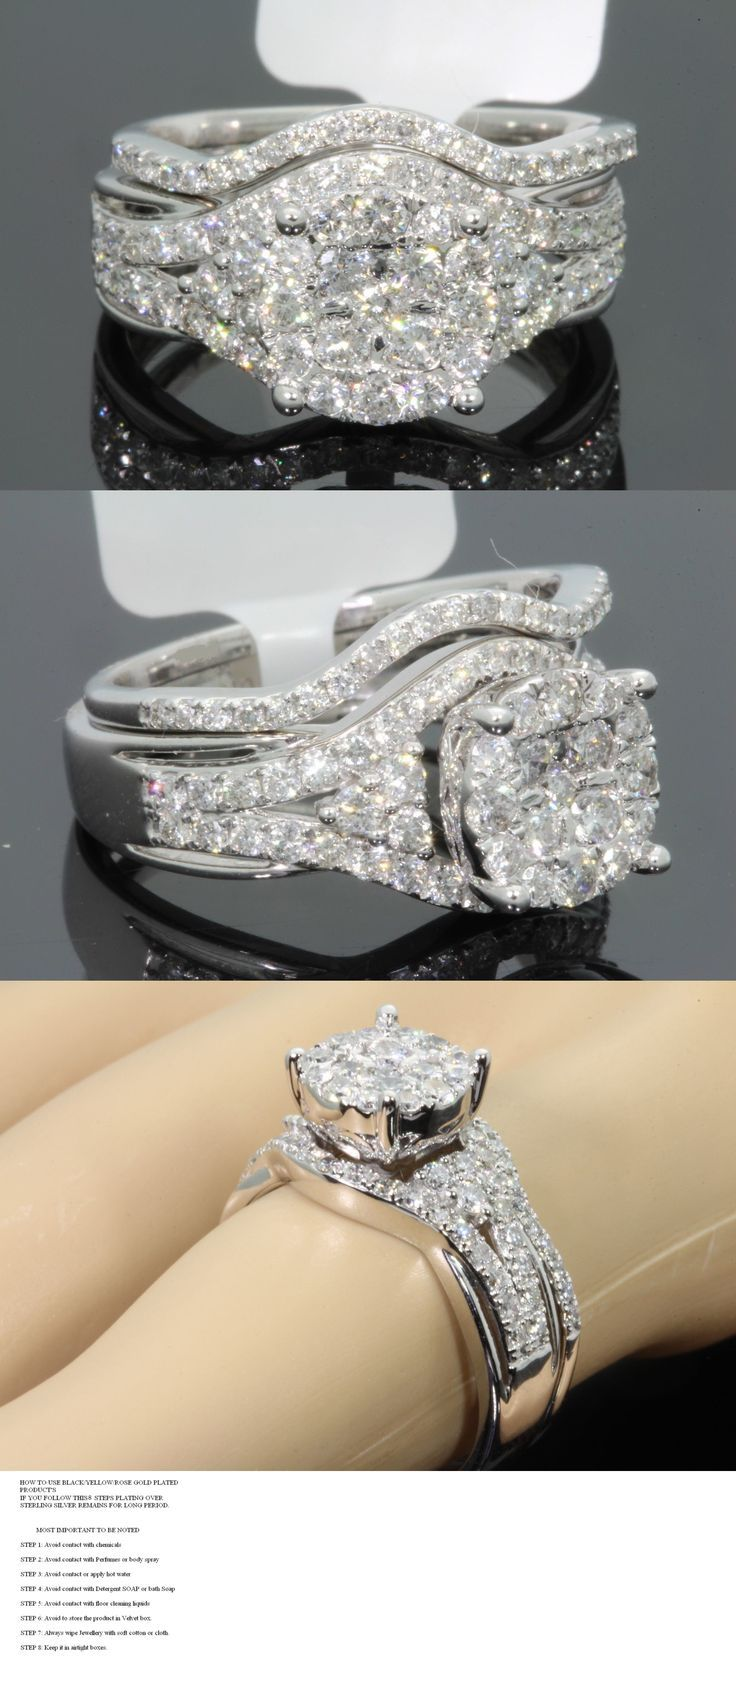 Wedding rings: 2.20 Ct Round Diamond Engagement Bridal Ring Wedding Band Set 14K White Gold -> BUY IT NOW ONLY: $129.85 on eBay!